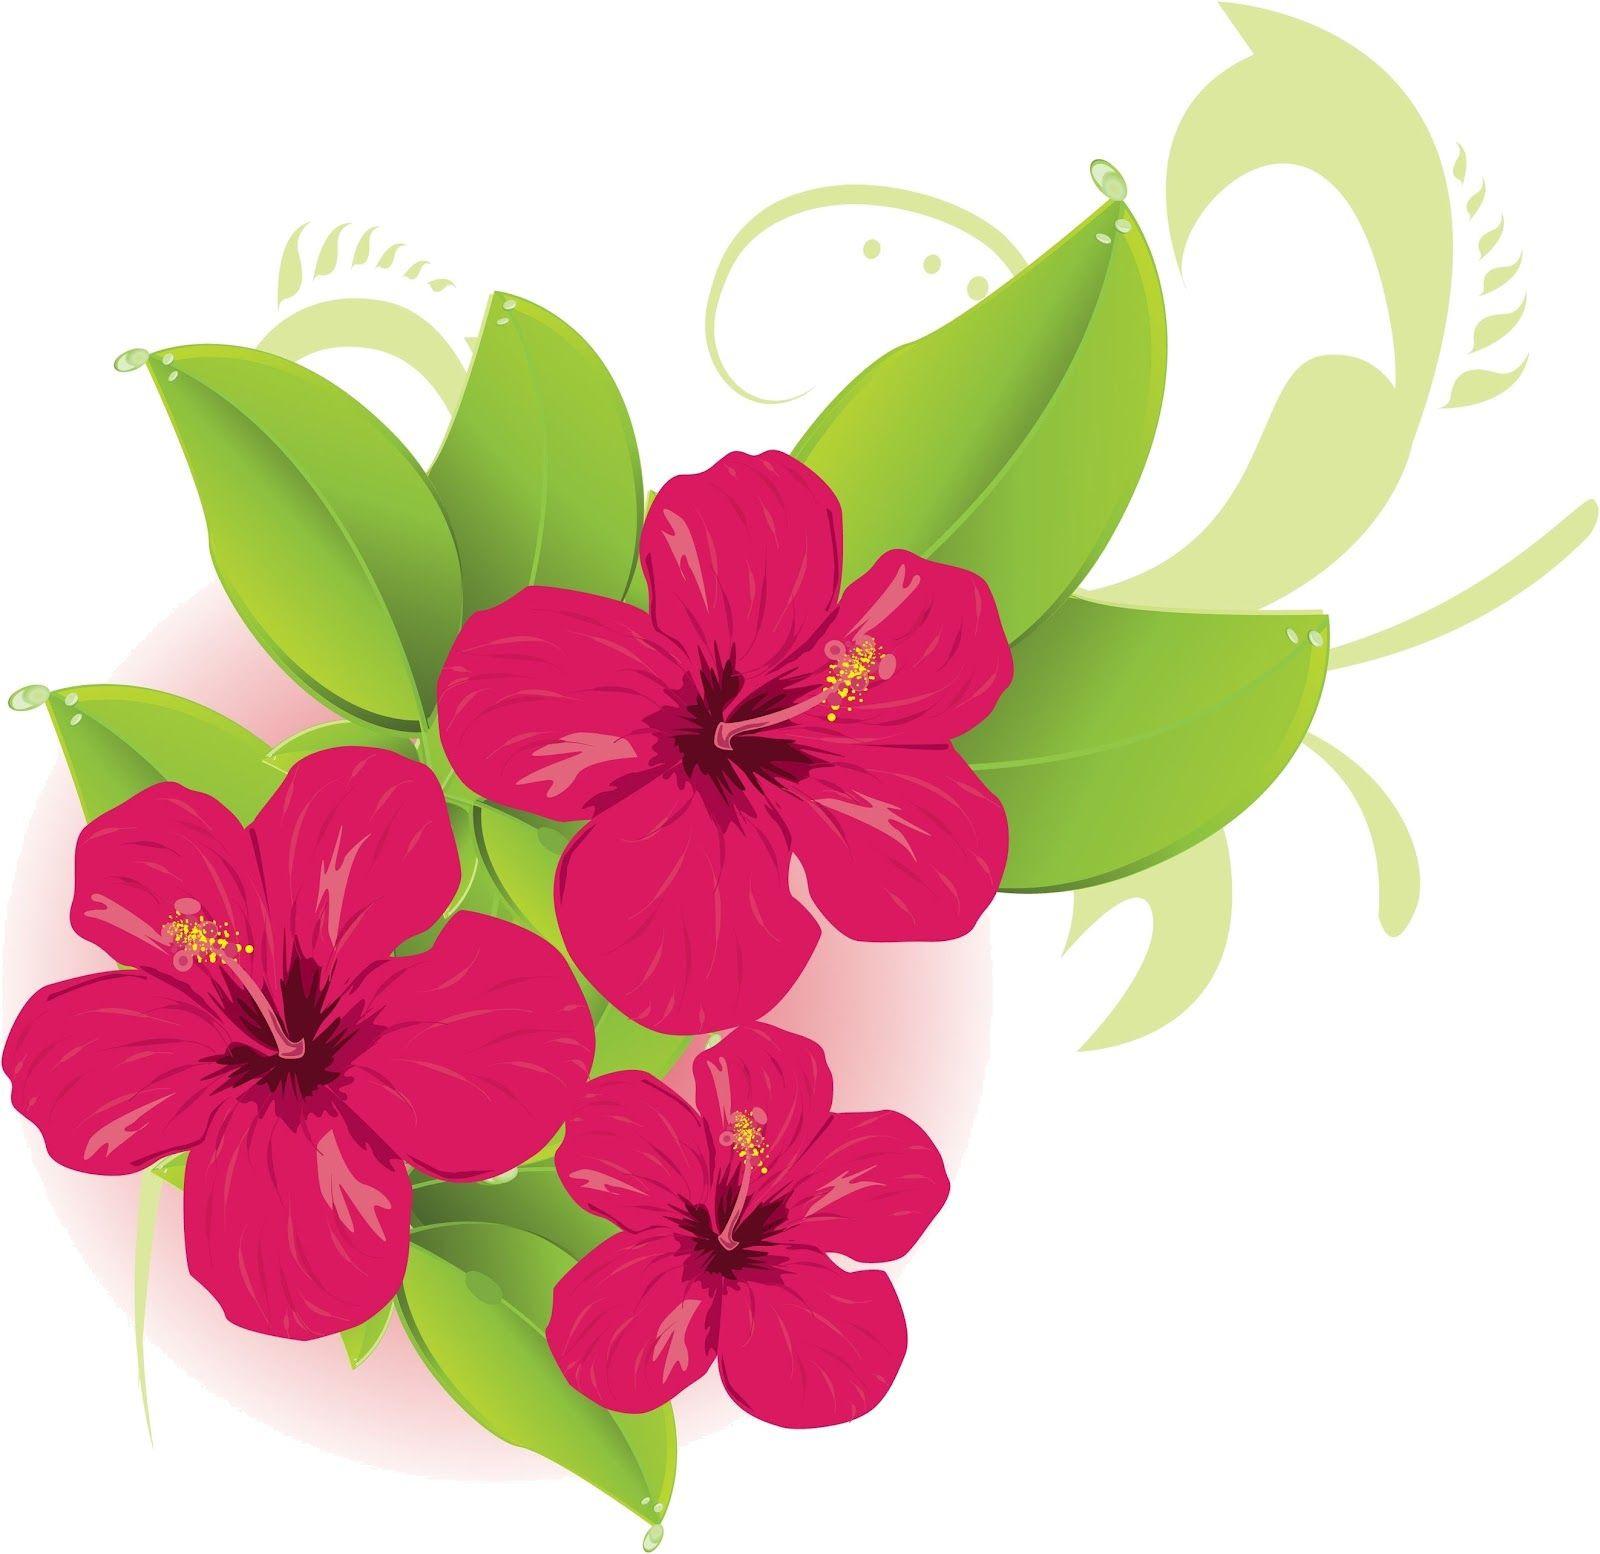 1600x1554 Hawaiian Flower Clip Art Hibiscus Flowers In Six Colors Free